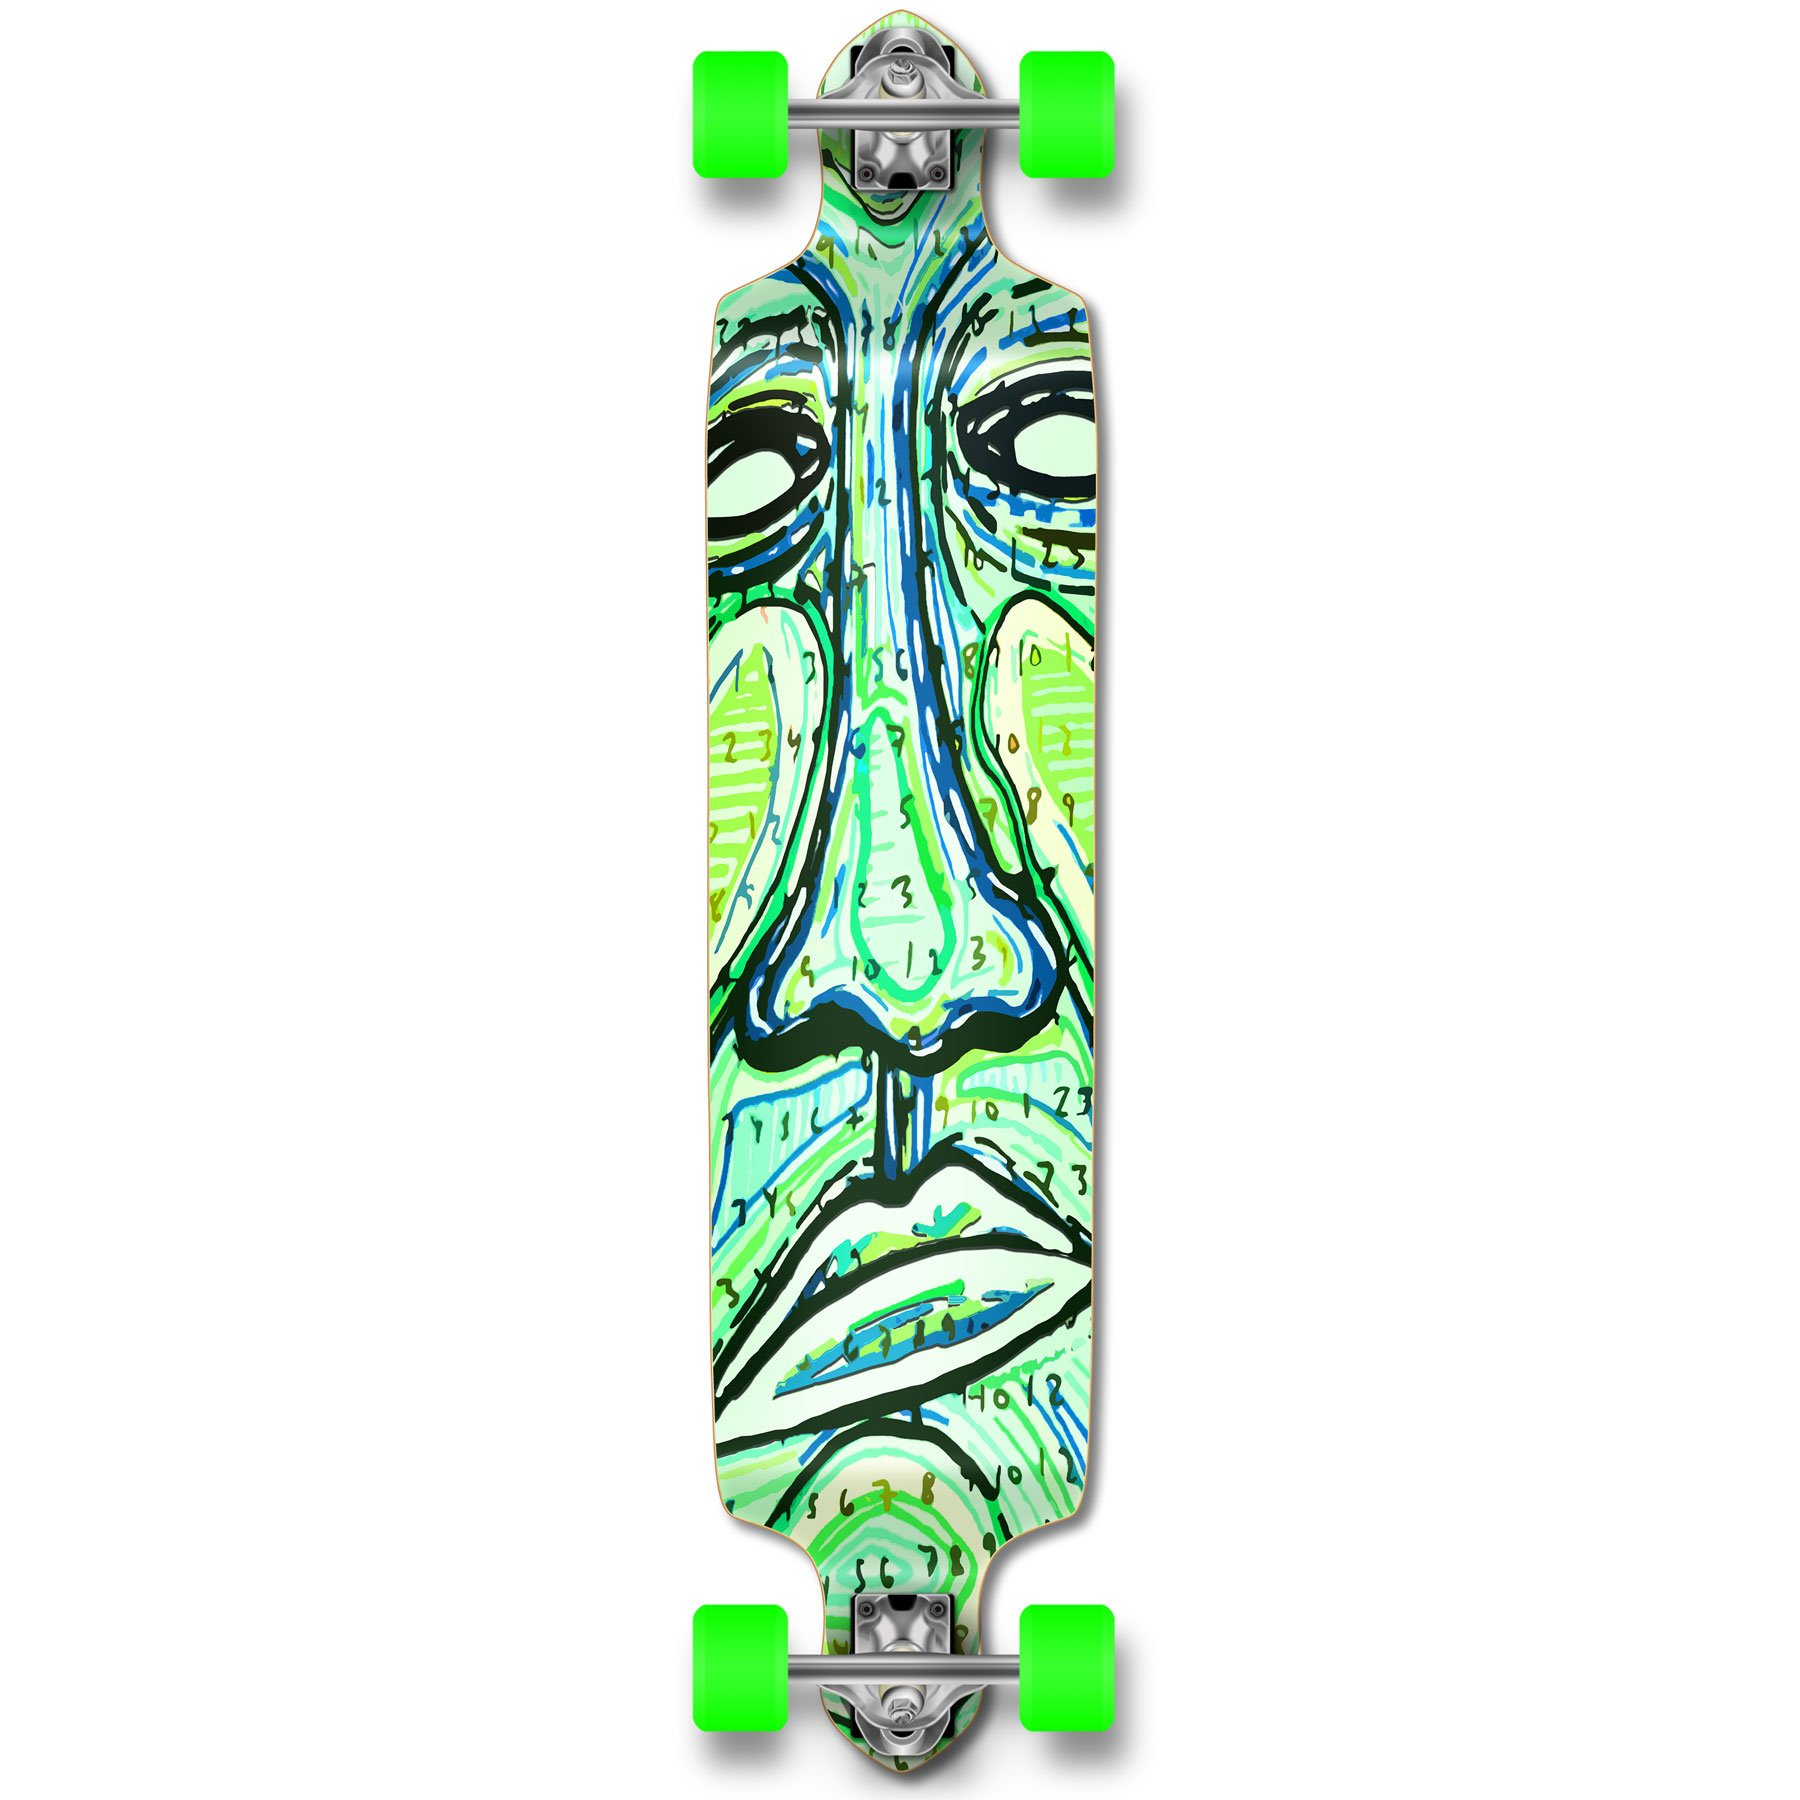 Yocaher Drop down Pro longboard complete Cruiser downhill freestyle freeride skateboard (Countdown)